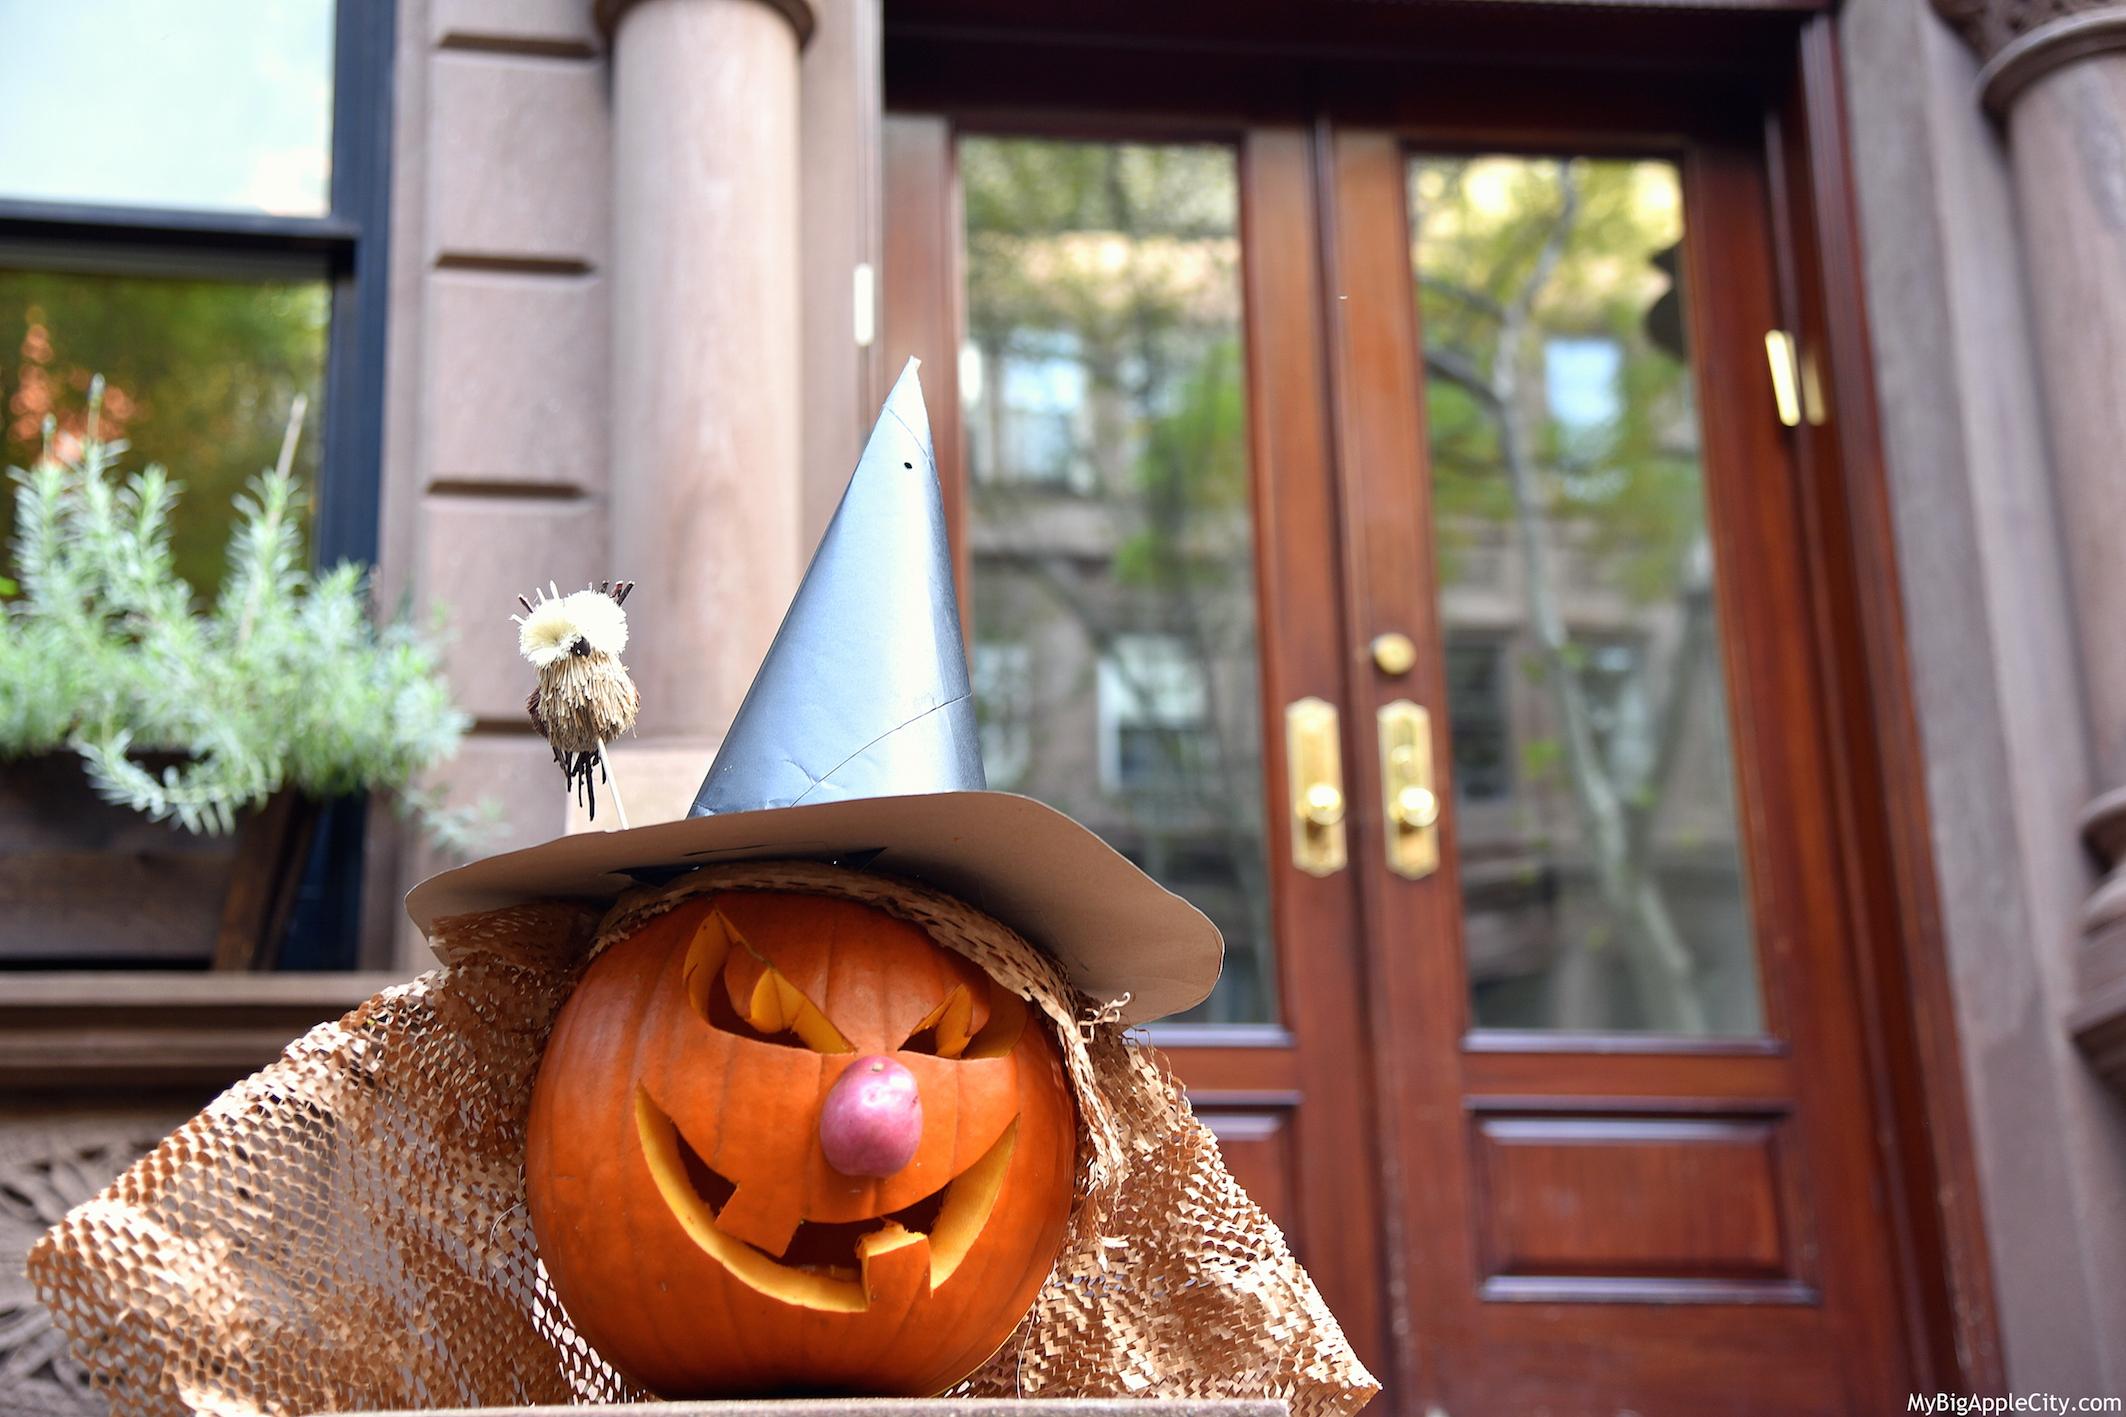 Pumpkin-Halloween-NYC-2015-Lifestyle-blog-newyork